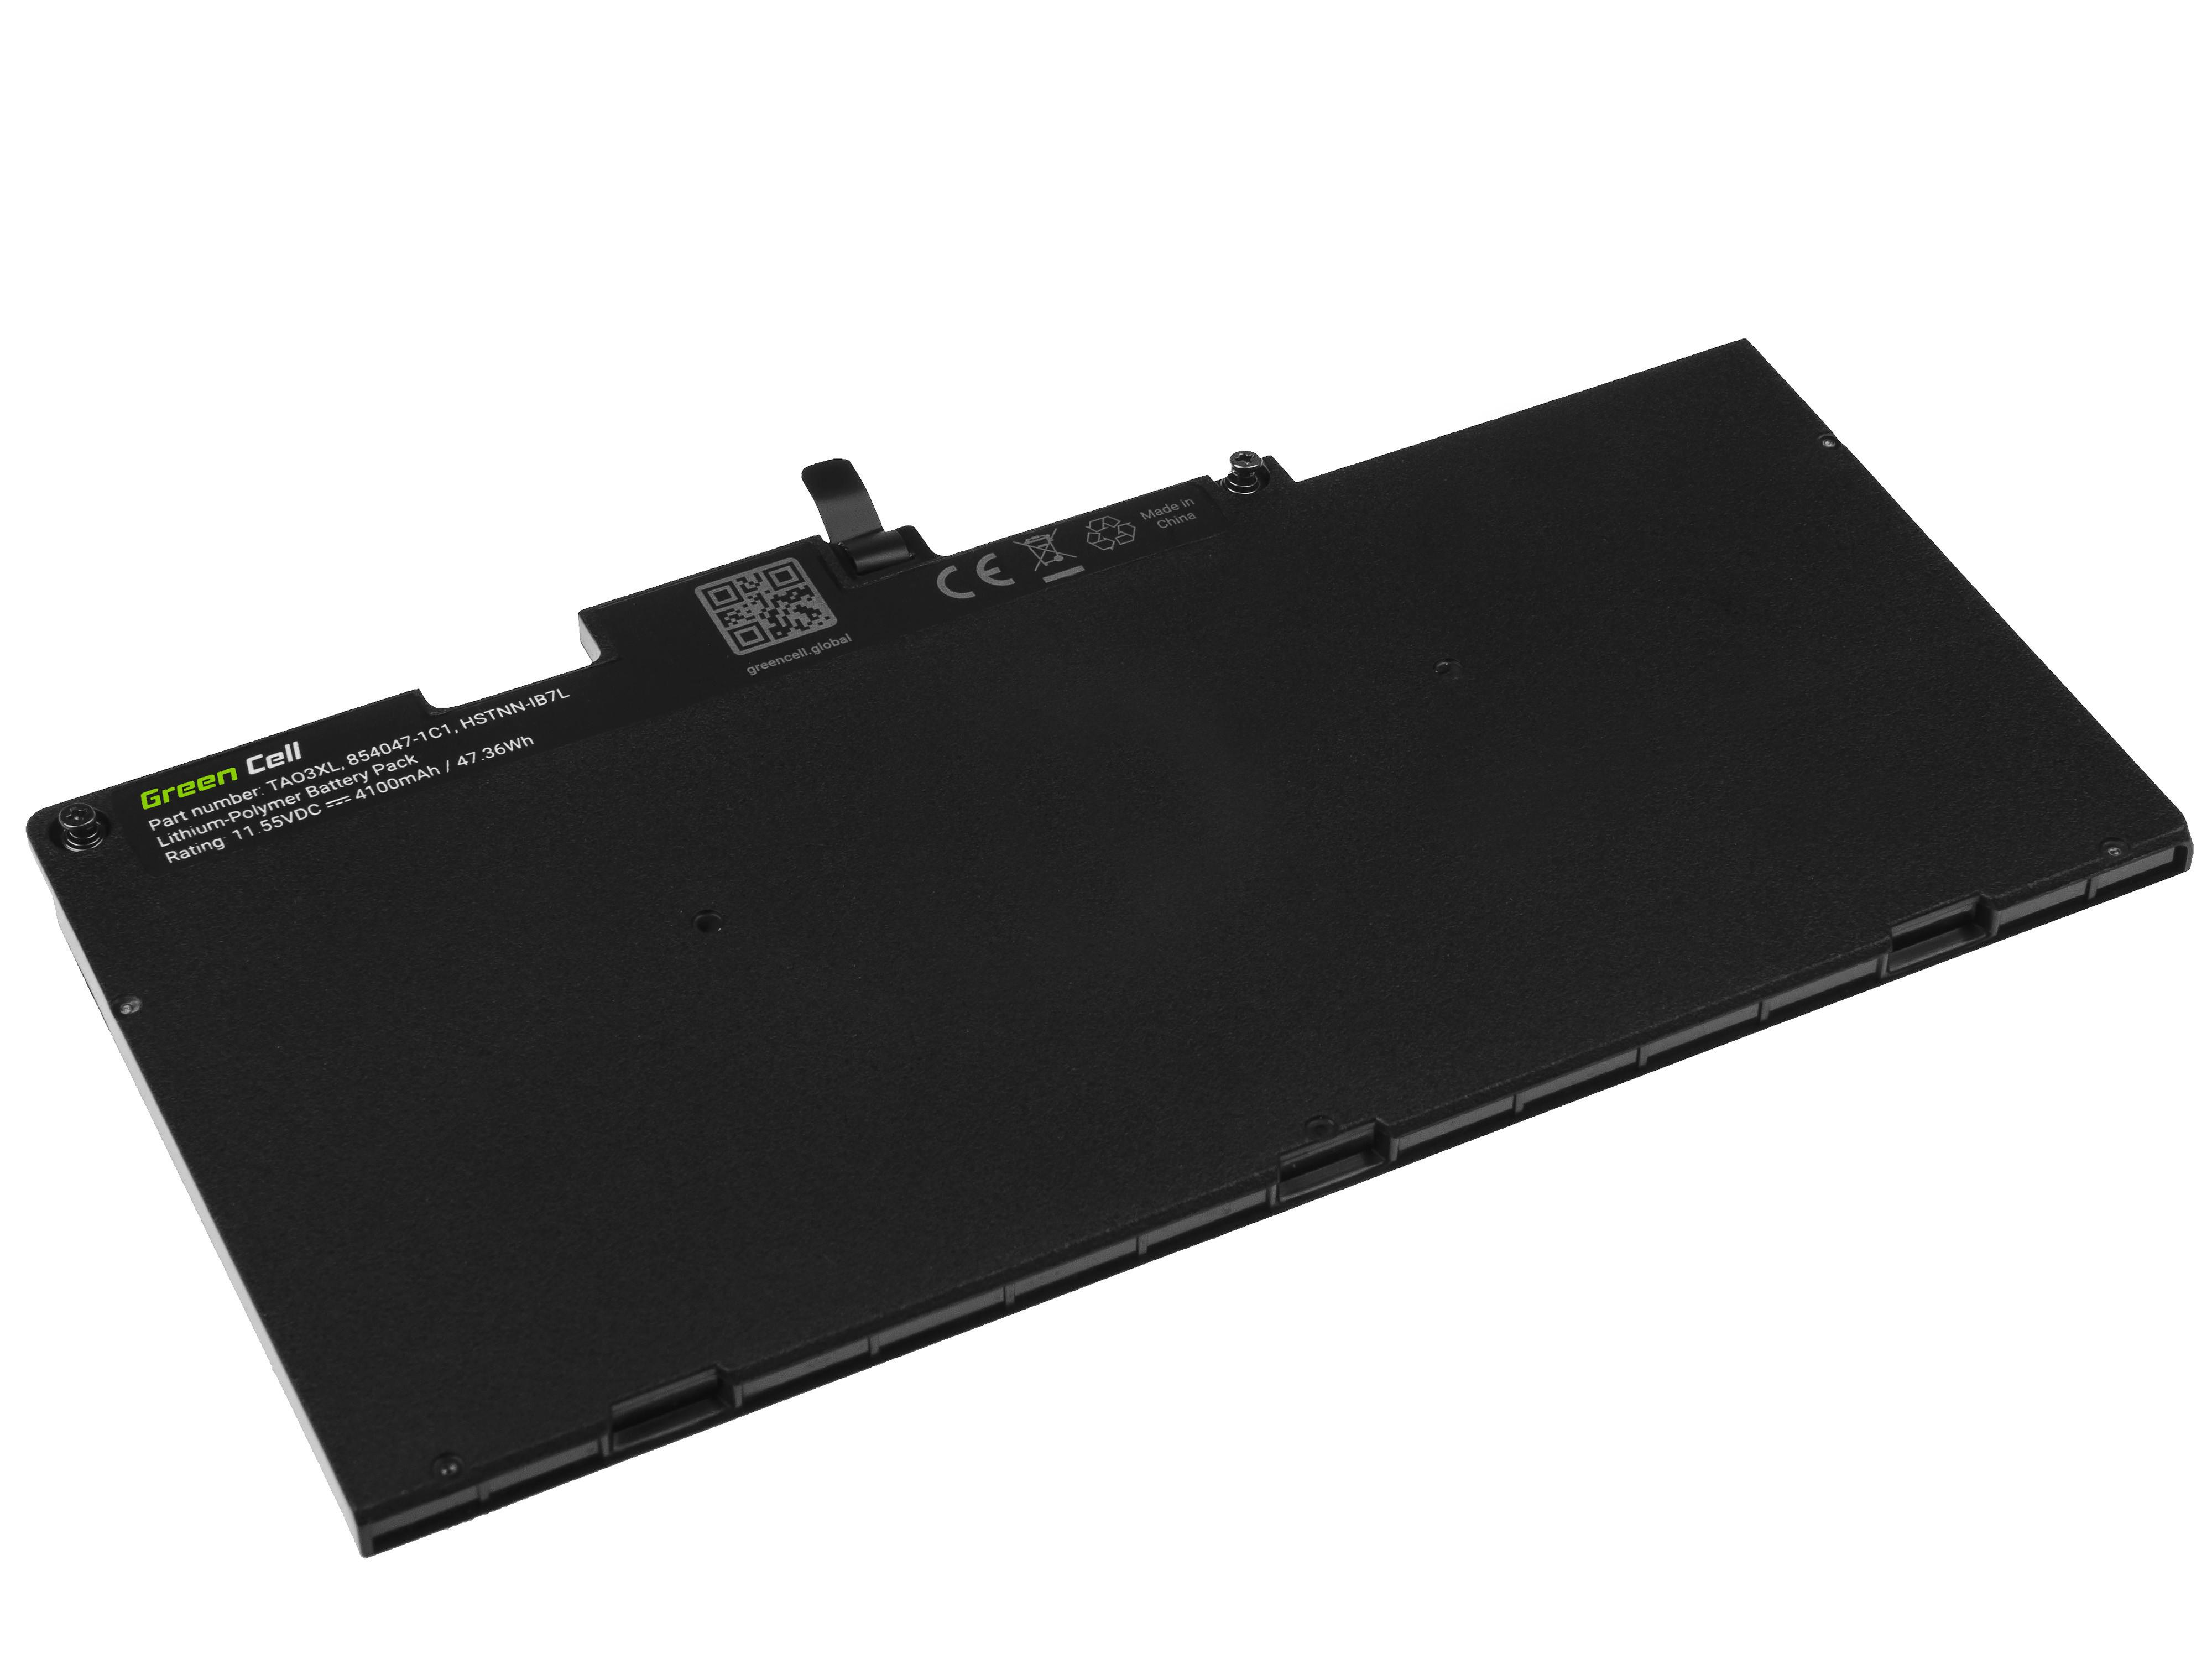 Green Cell Baterie TA03XL pro HP EliteBook 745 G4 755 G4 840 G4 850 G4, HP ZBook 14u G4 15u G4, HP mt43